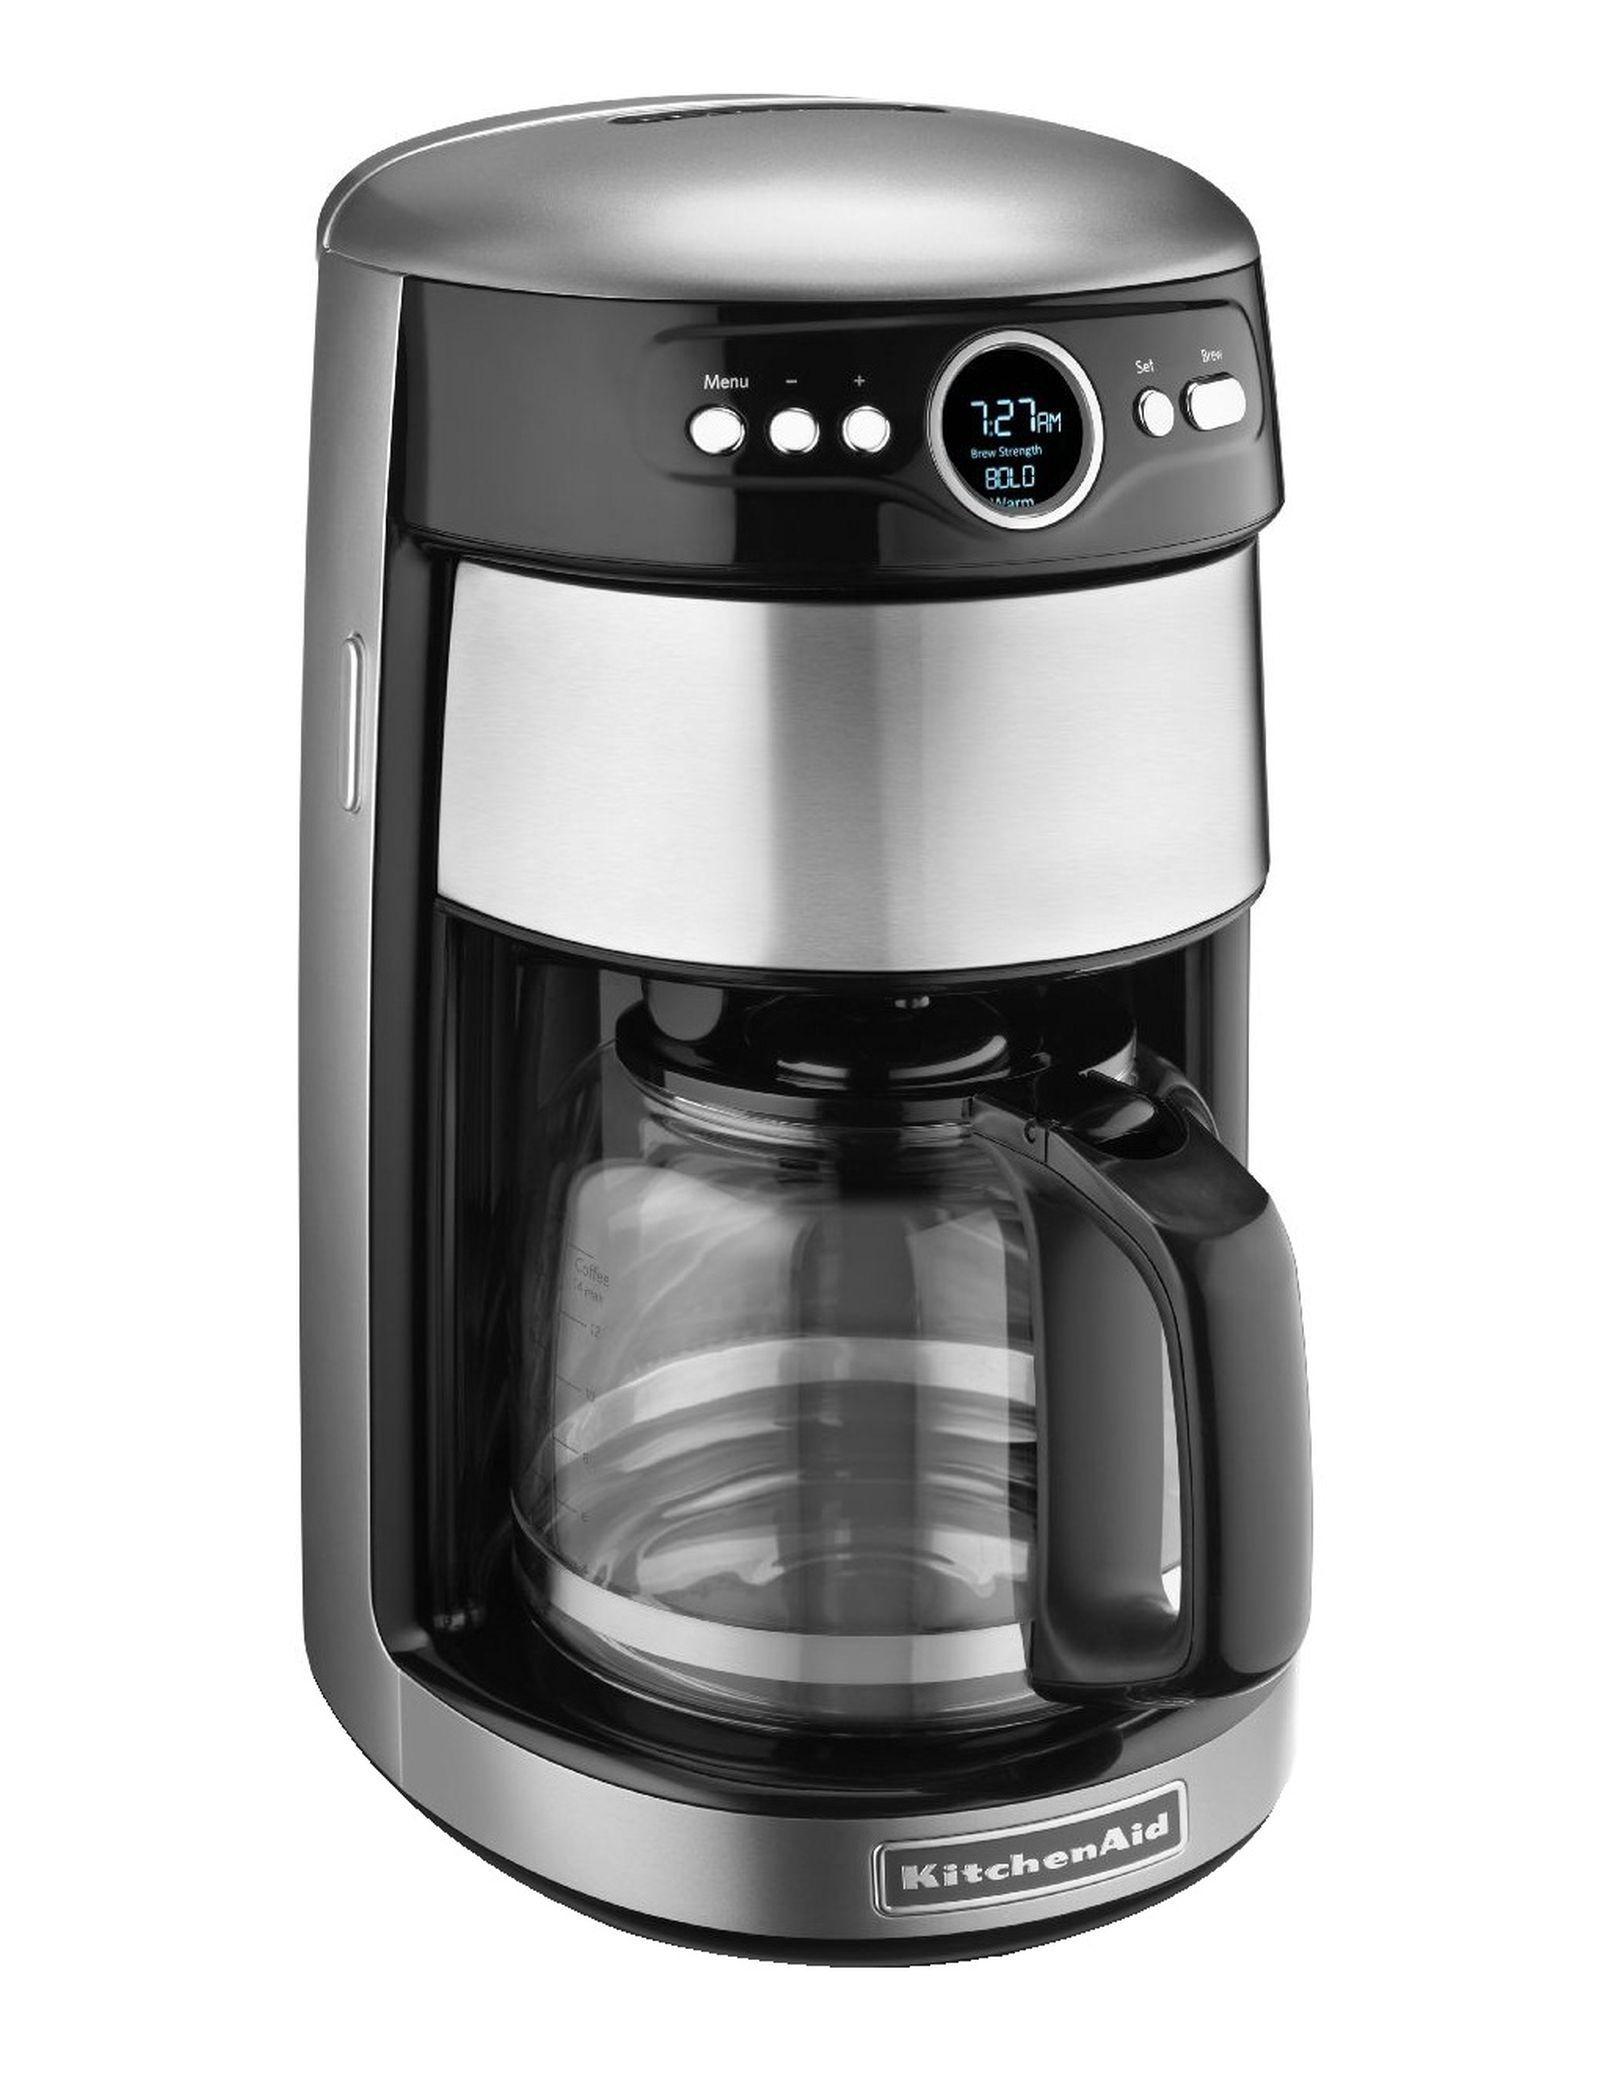 KitchenAid KCM1402ES 14-Cup Glass Carafe Coffee Maker - Espresso - Appliances - Small Kitchen ...